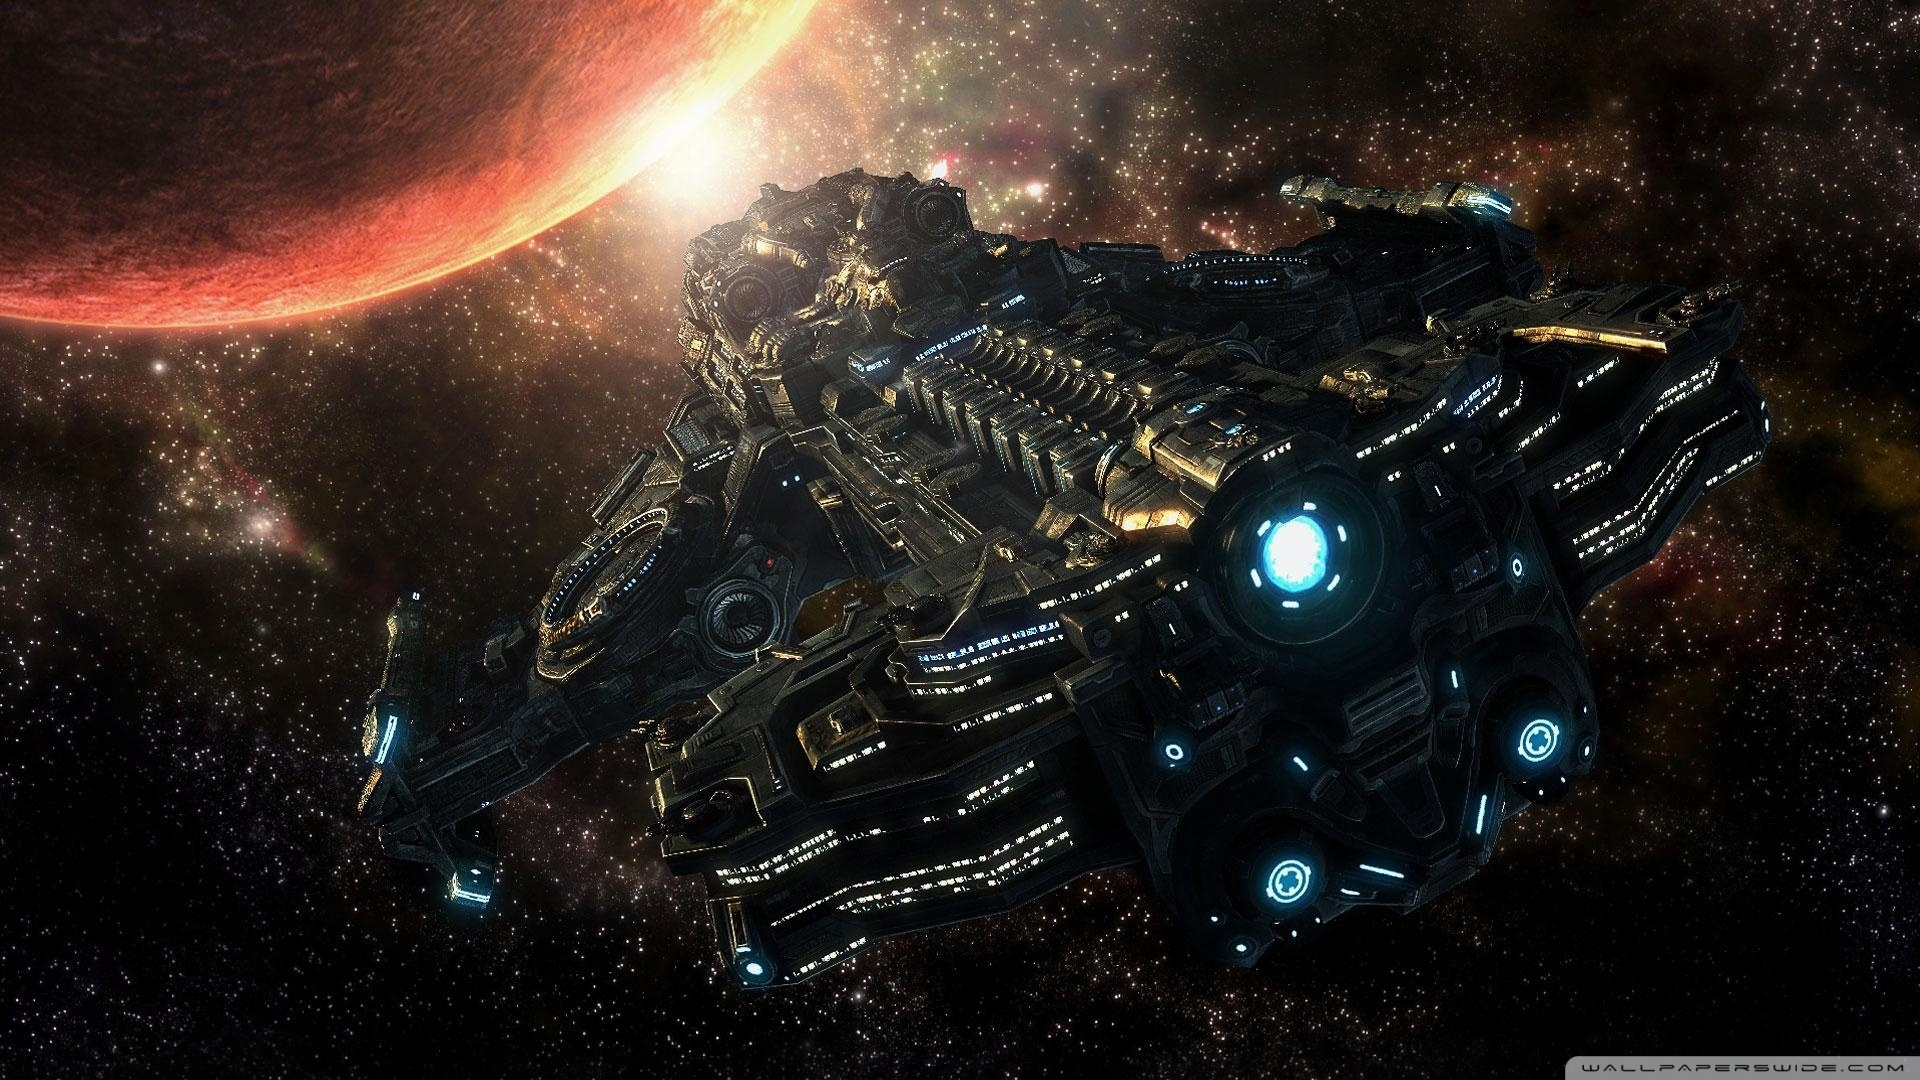 starcraft 2 game ❤ 4k hd desktop wallpaper for 4k ultra hd tv